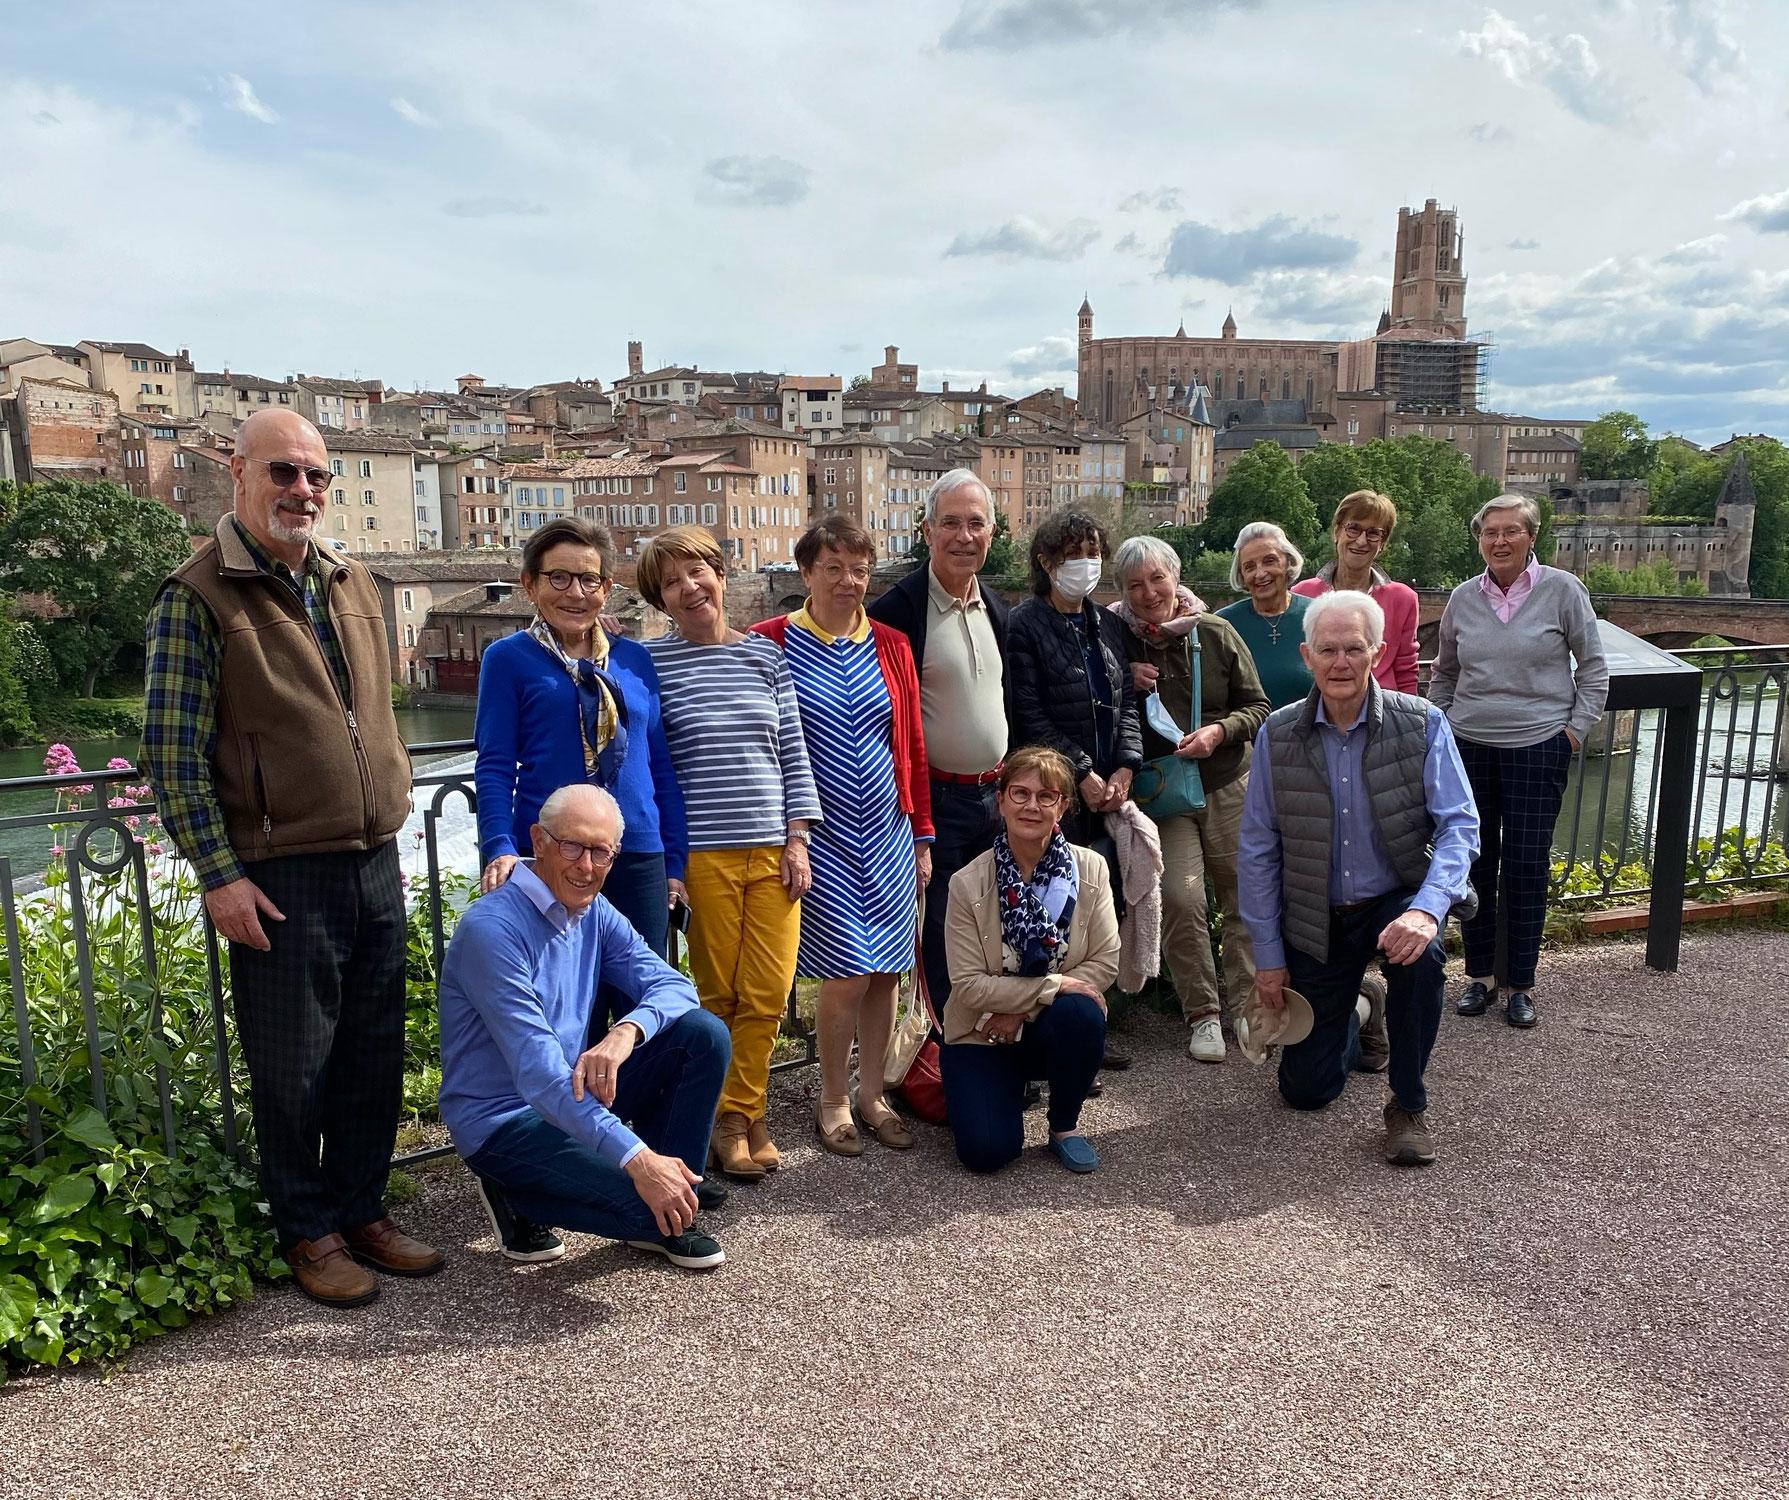 Visite du musée Lapérouse square Botany Bay Albi 21 mai 2021